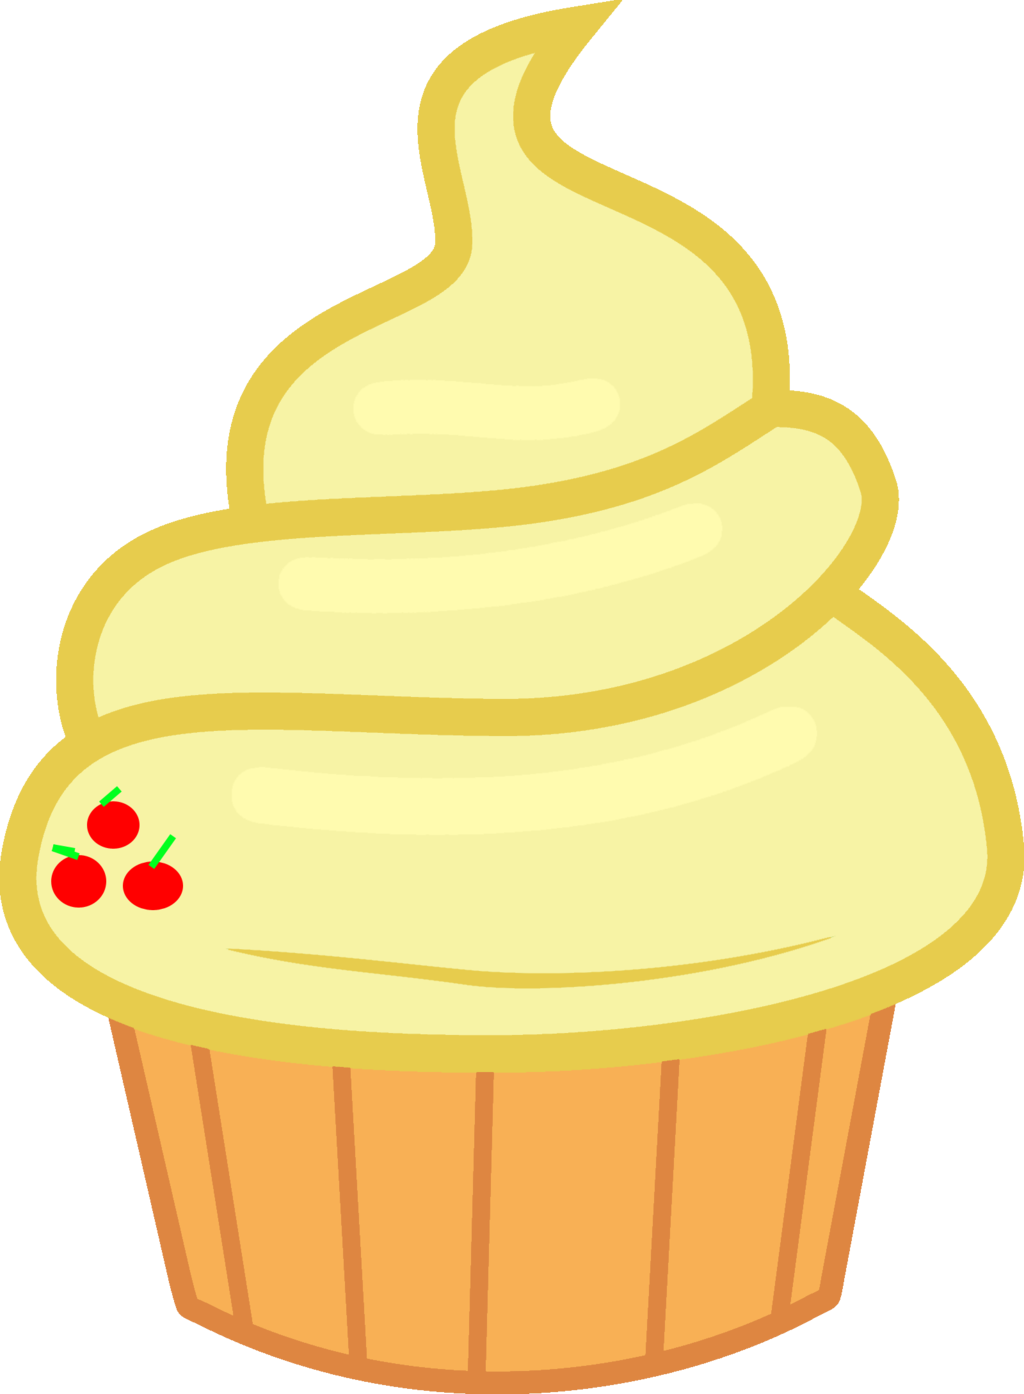 Yogurt clipart vector. Applejack cupcake by magicdog